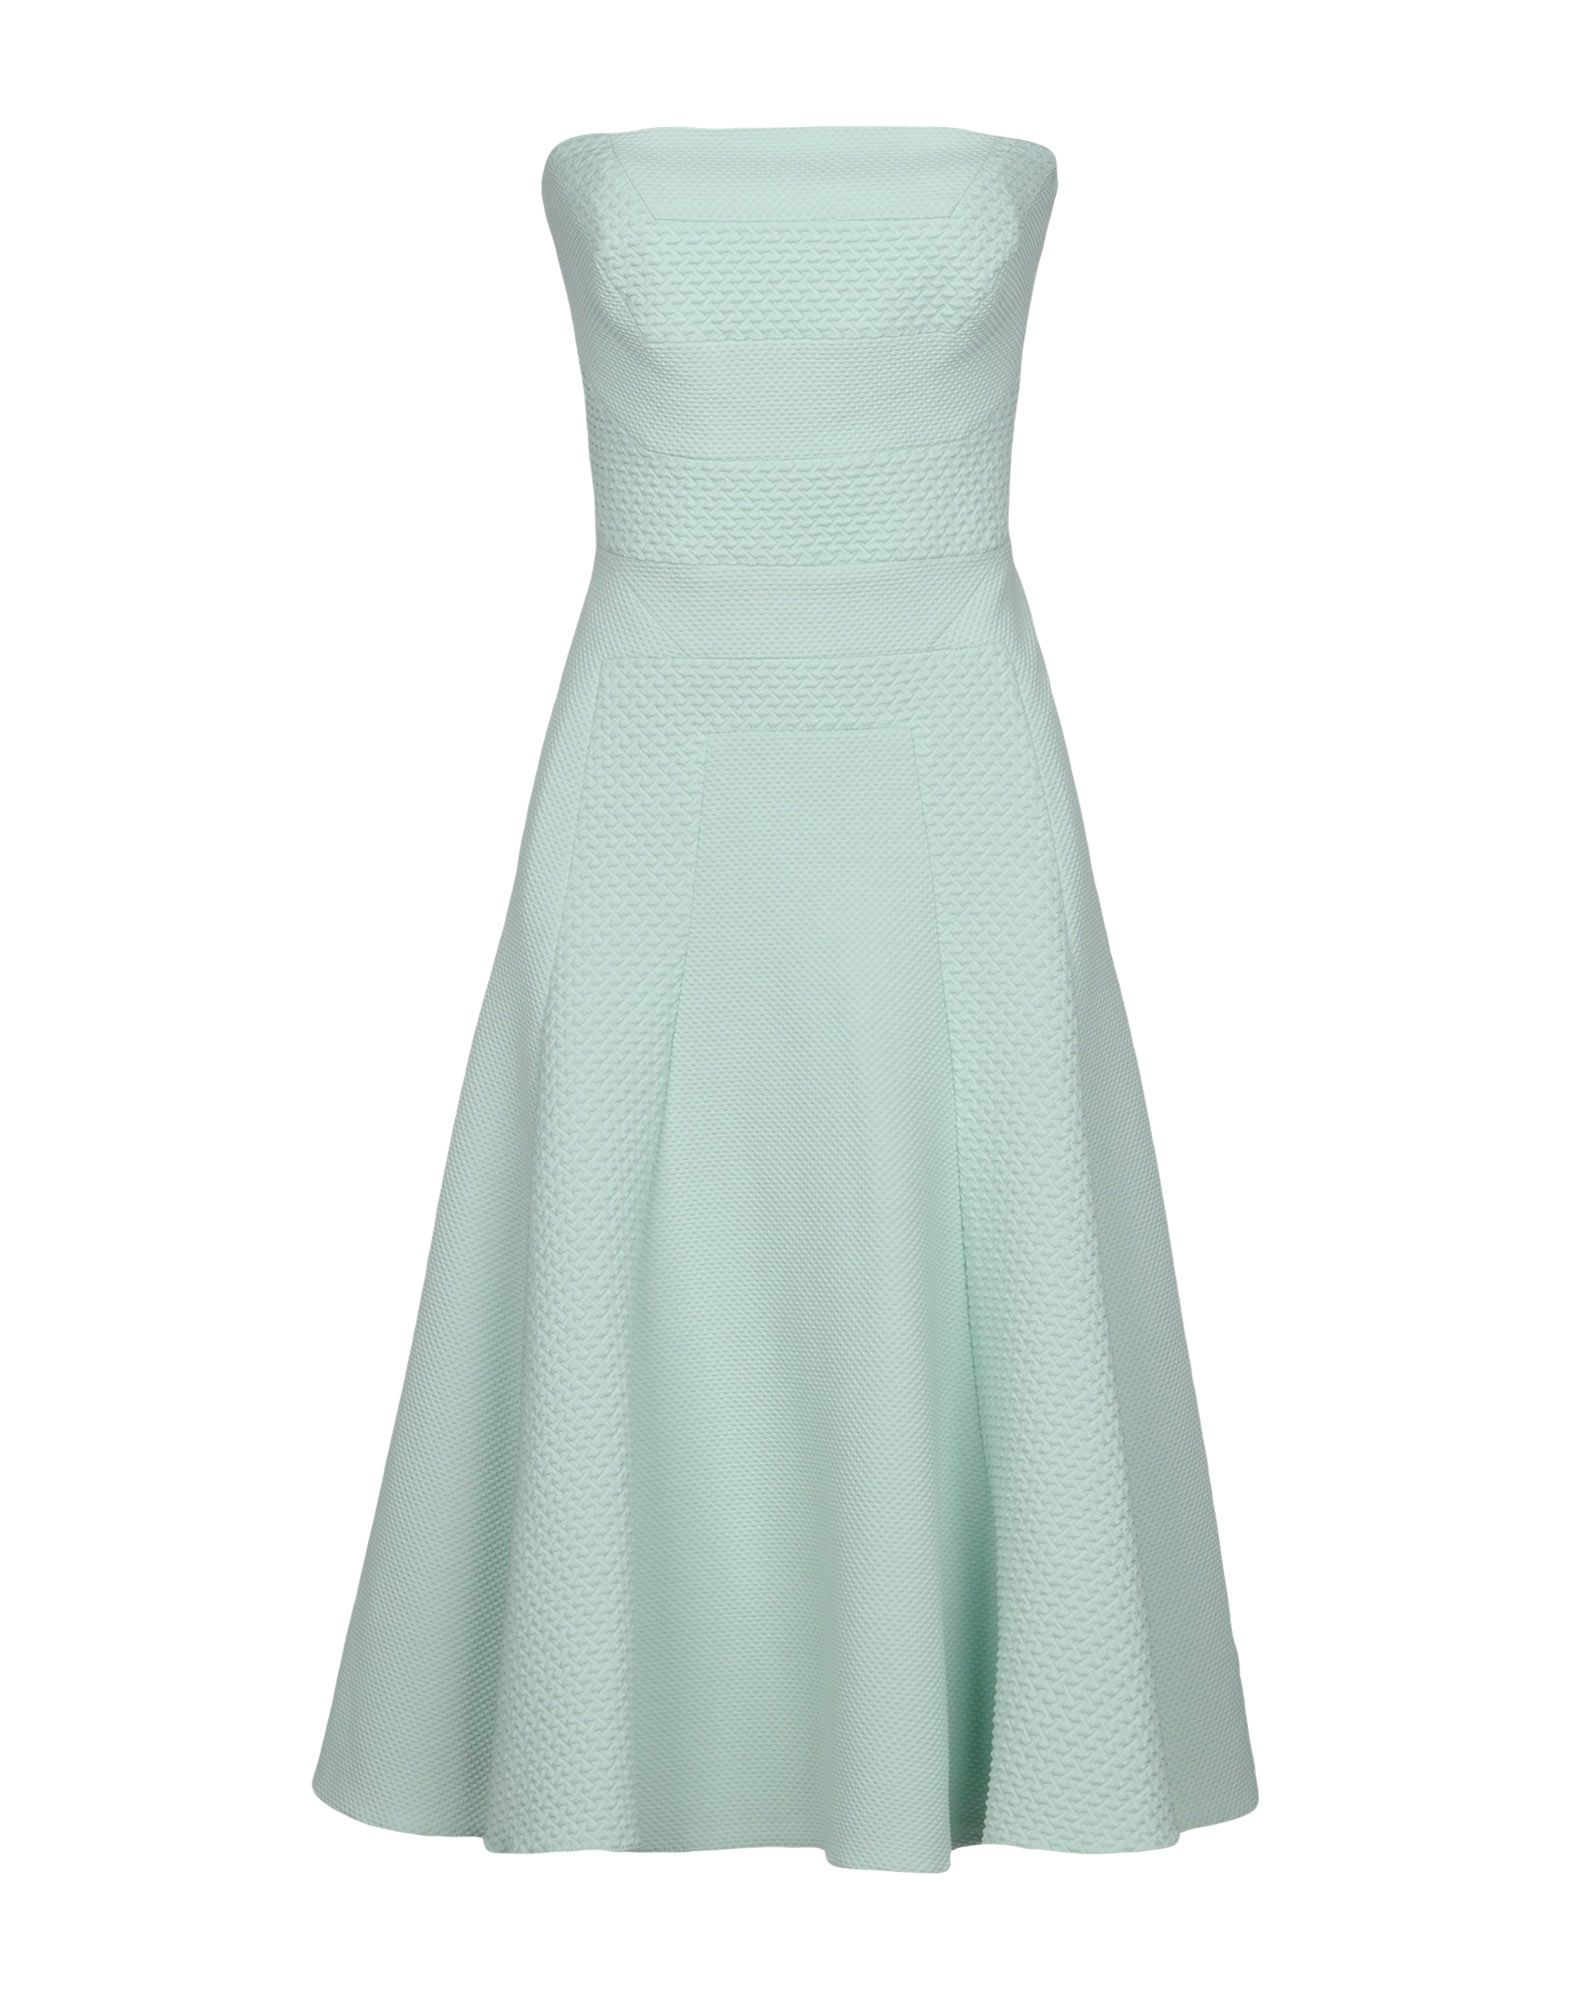 KAREN MILLEN KNEE-LENGTH DRESSES, LIGHT GREEN | ModeSens